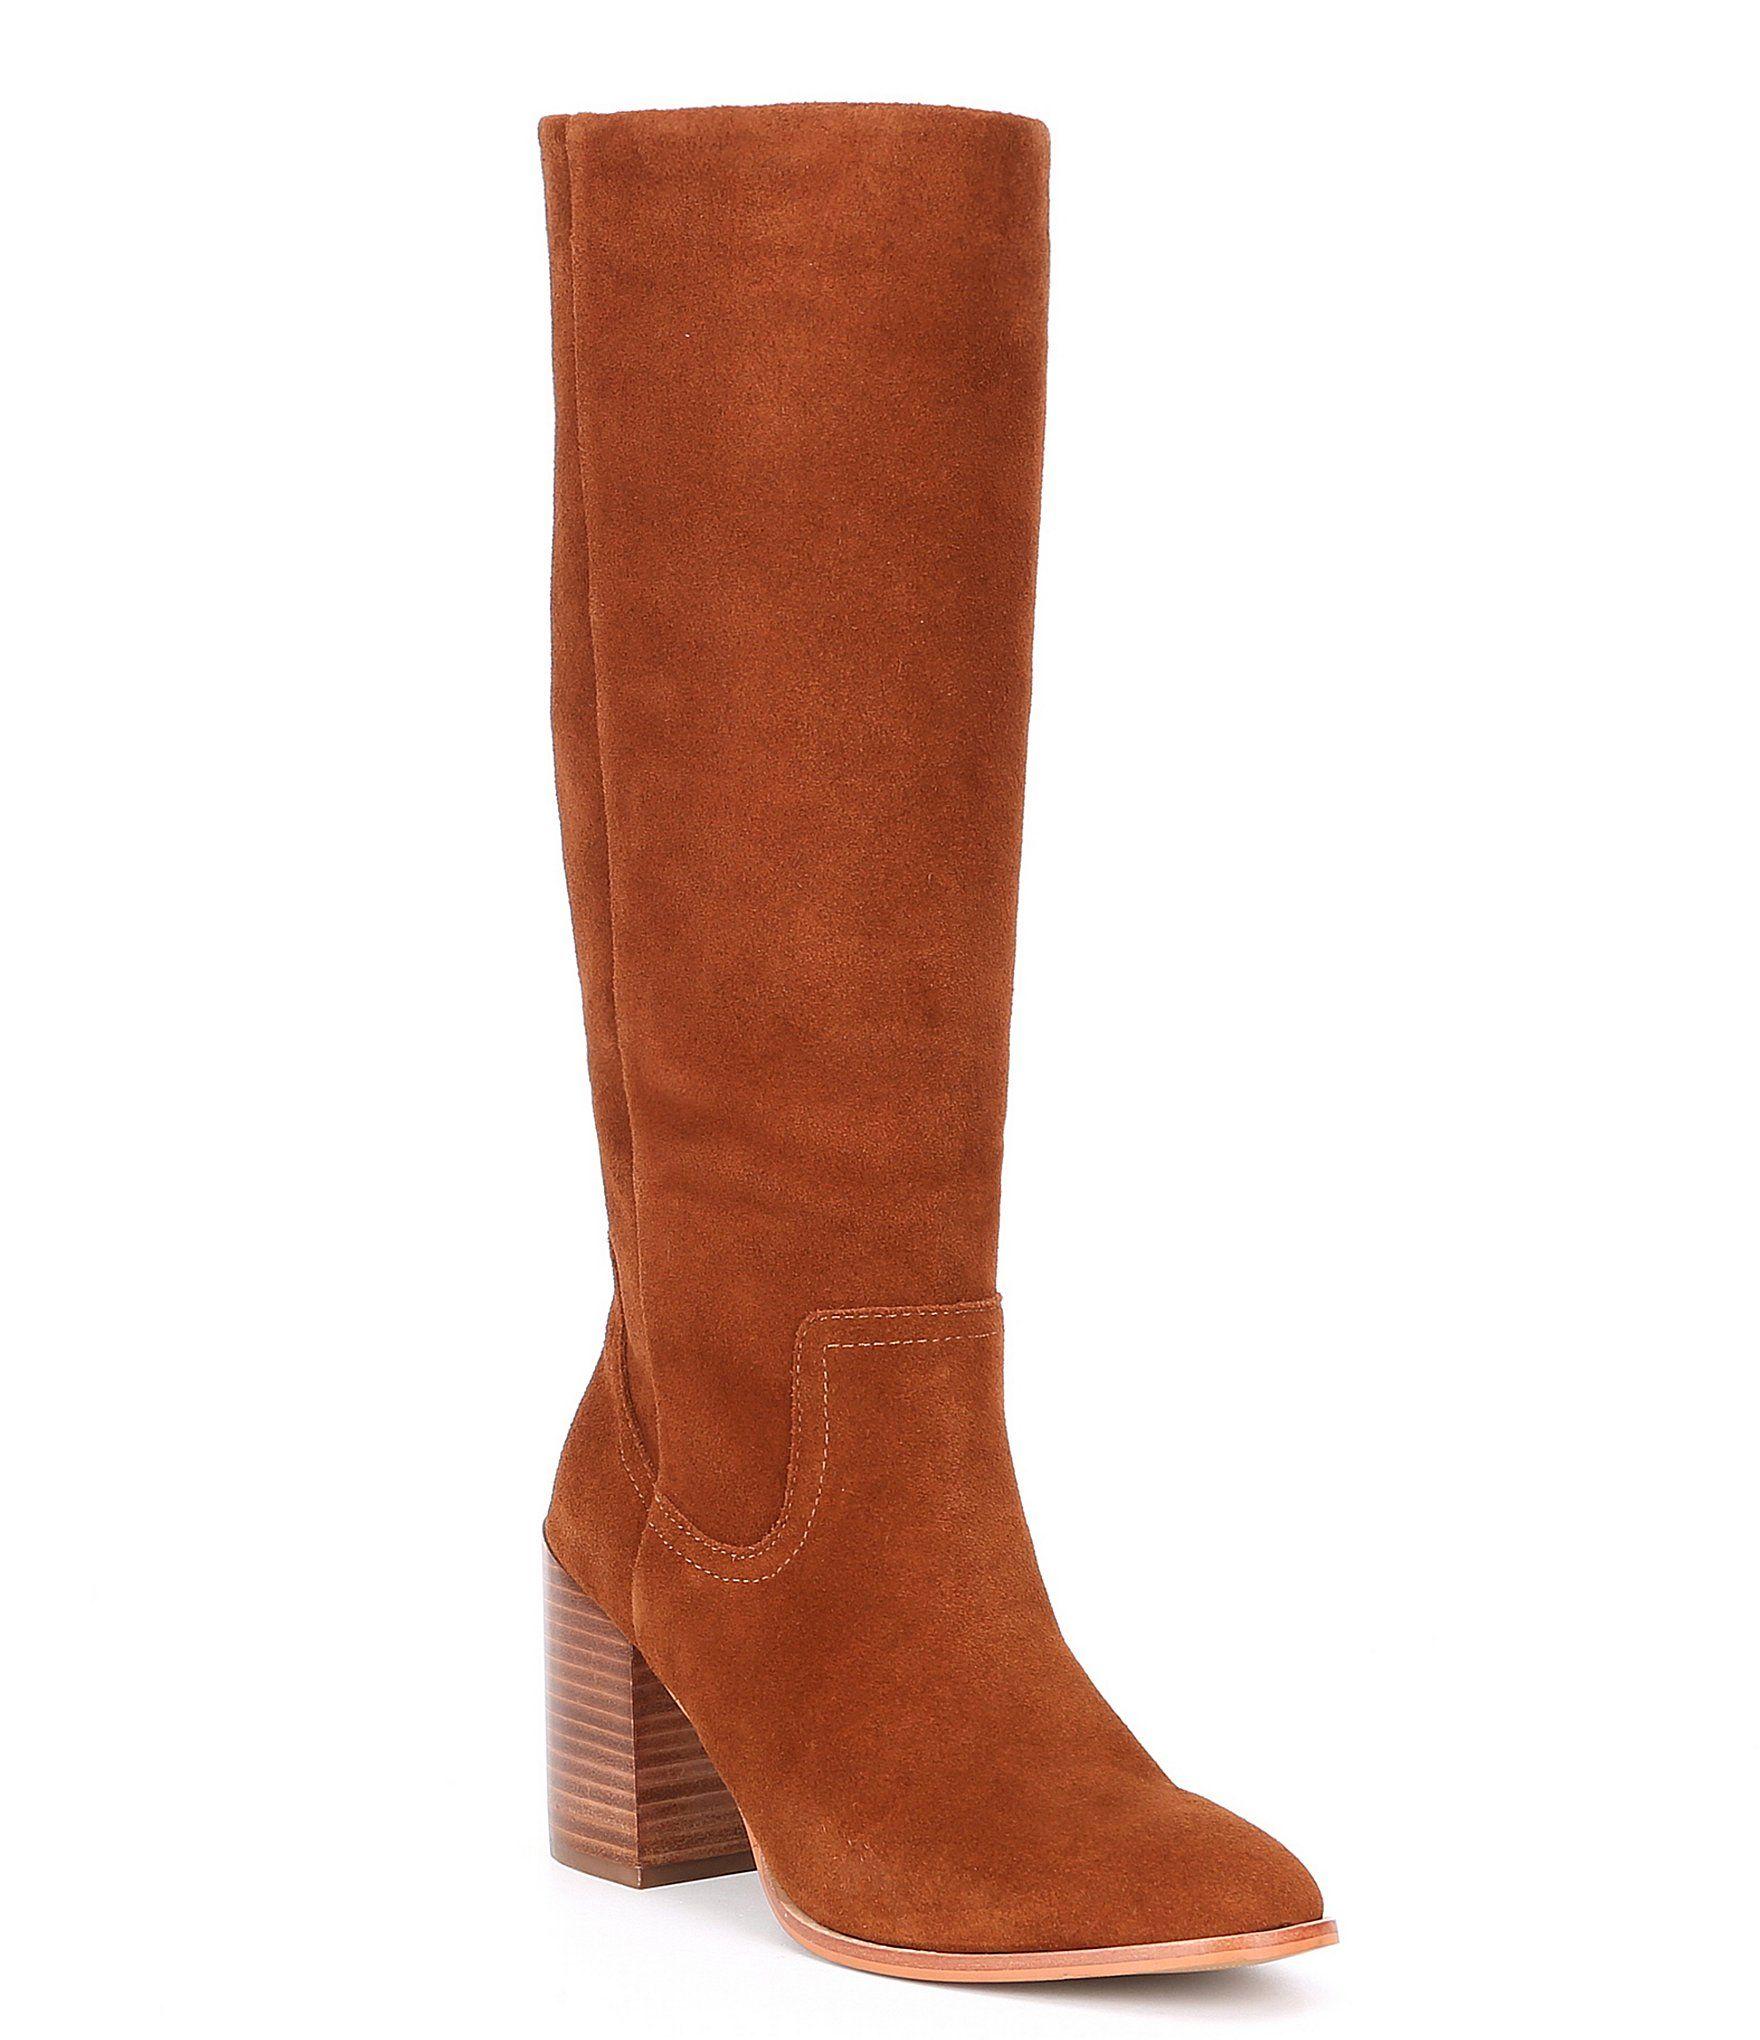 pelo puramente Oriental  Steve Madden Impact Tall Suede Stacked Block Heel Boots - Chestnut Suede  8.5M | Block heel boots, Boots, Heeled boots